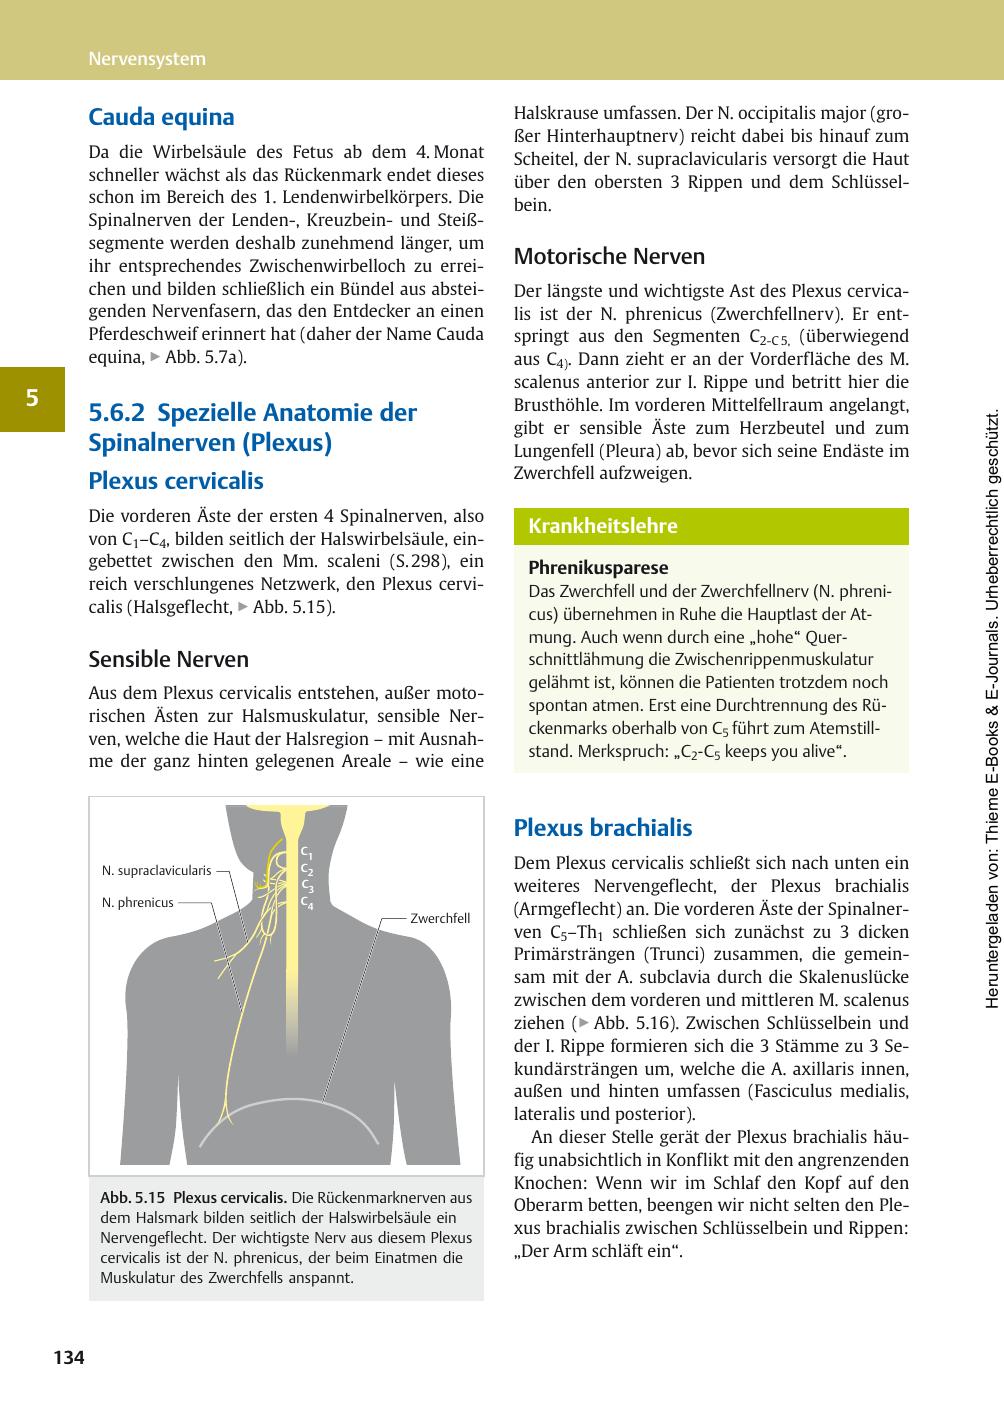 Cauda equina 5.6.2 Spezielle Anatomie der